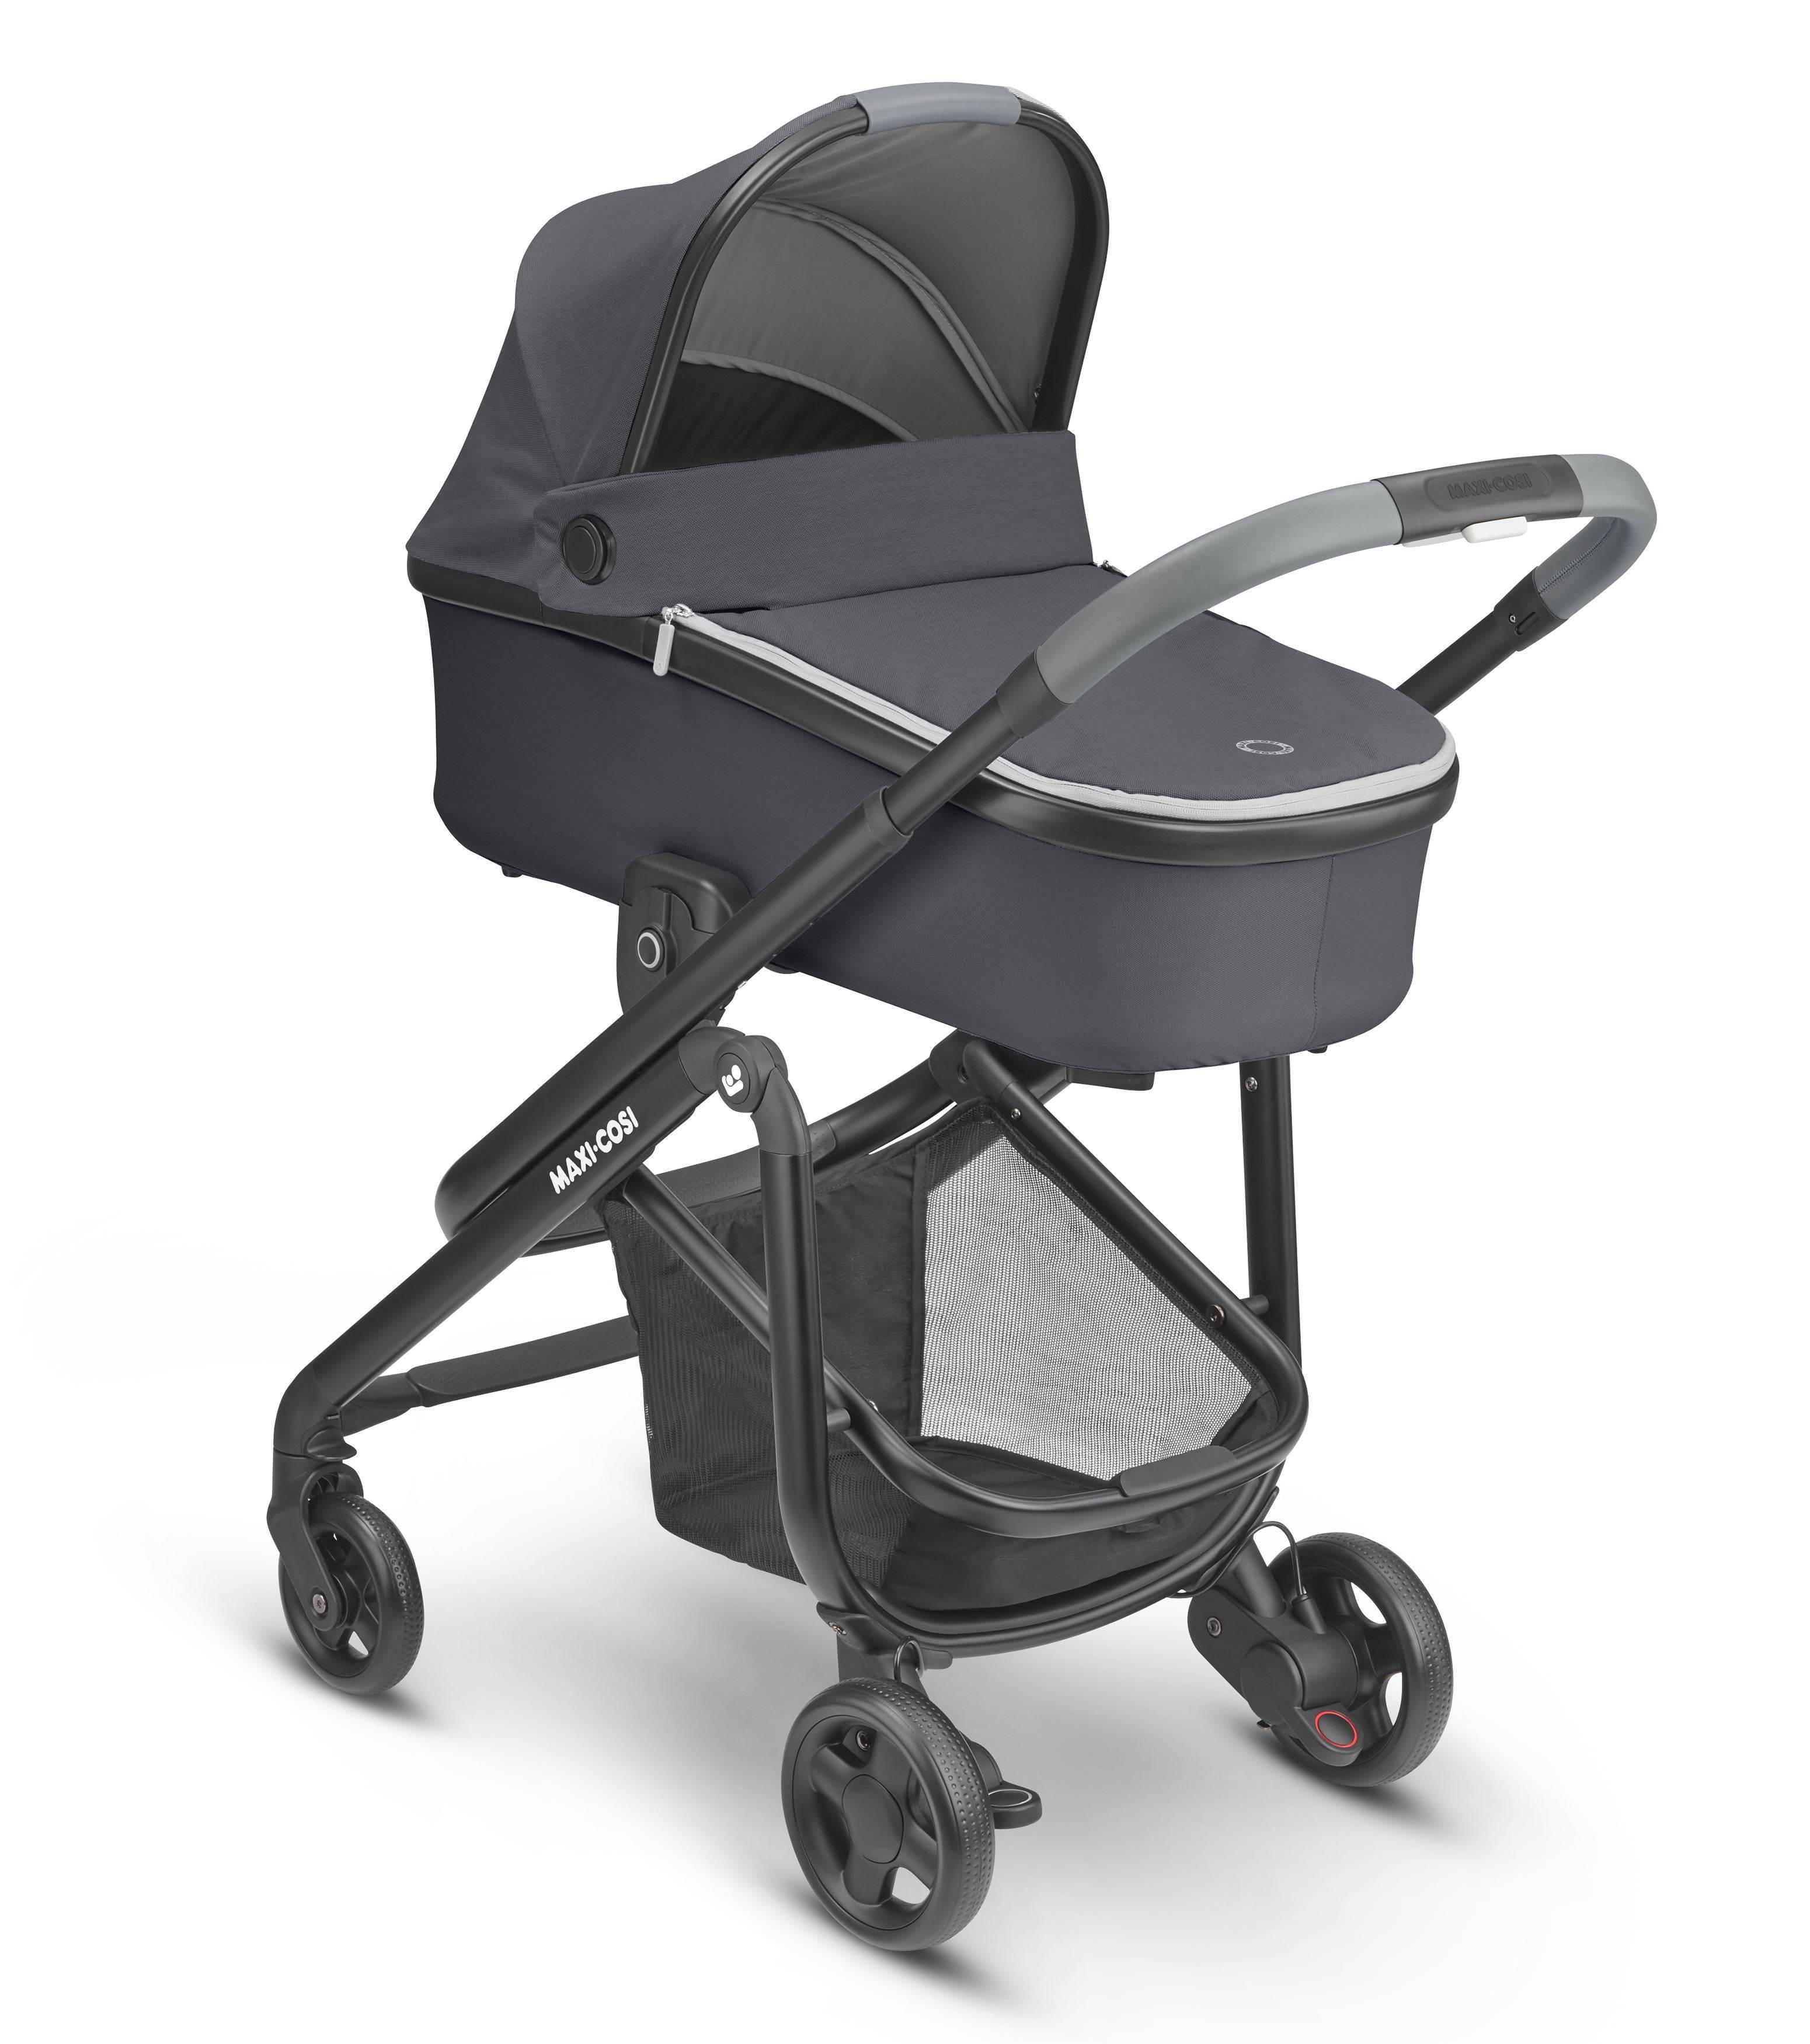 Coche duo LILA SP con capazo ORIA Essential graphite y G-0 Cabrio de REGALO